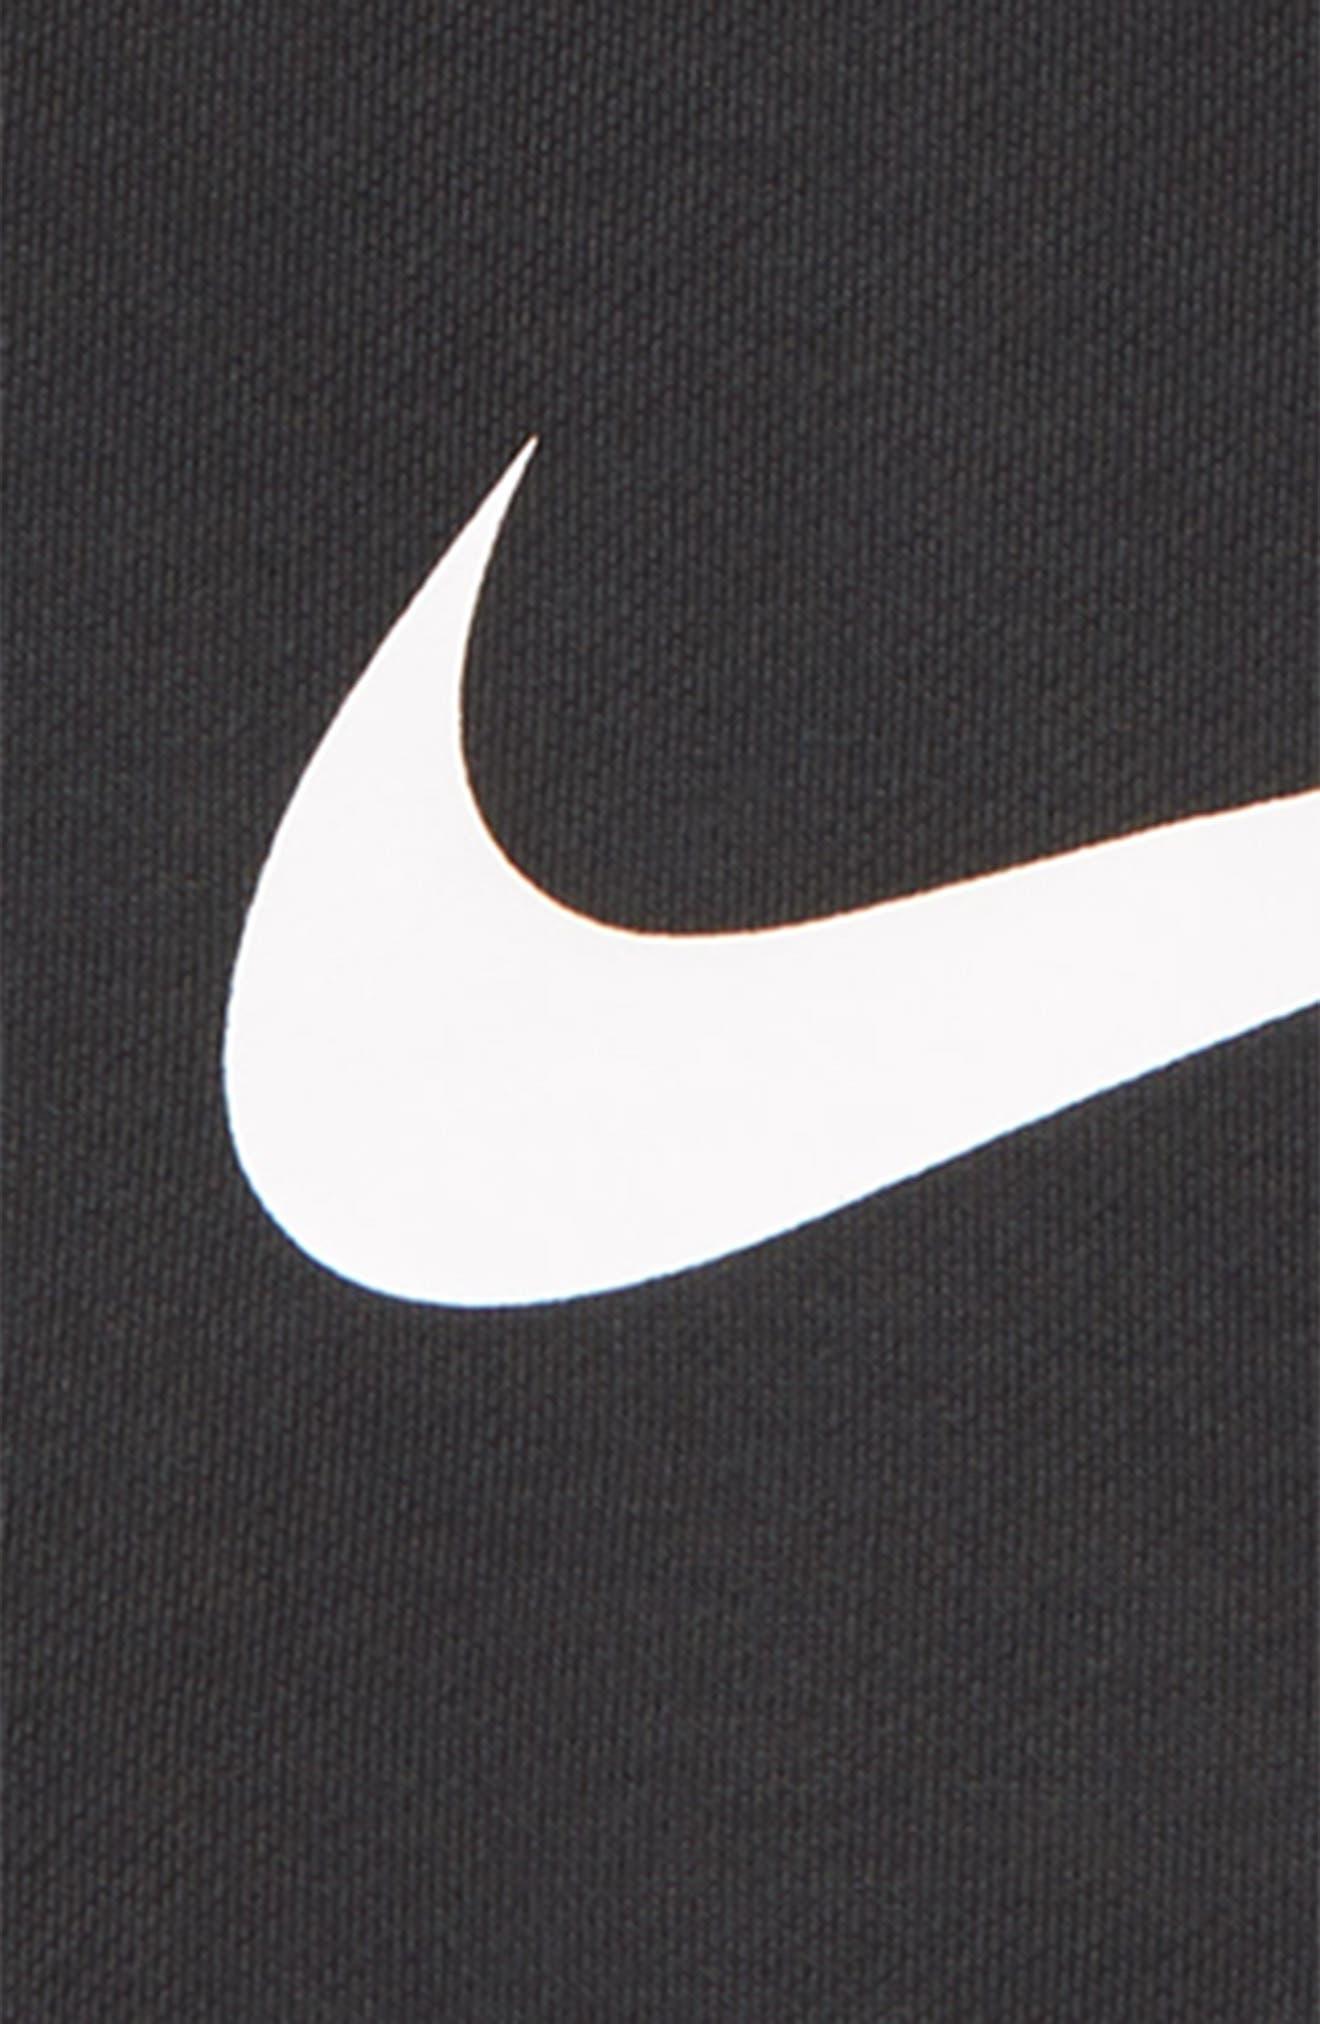 Dry Quarter Zip Pullover,                             Alternate thumbnail 2, color,                             ANTHRACITE/ WHITE